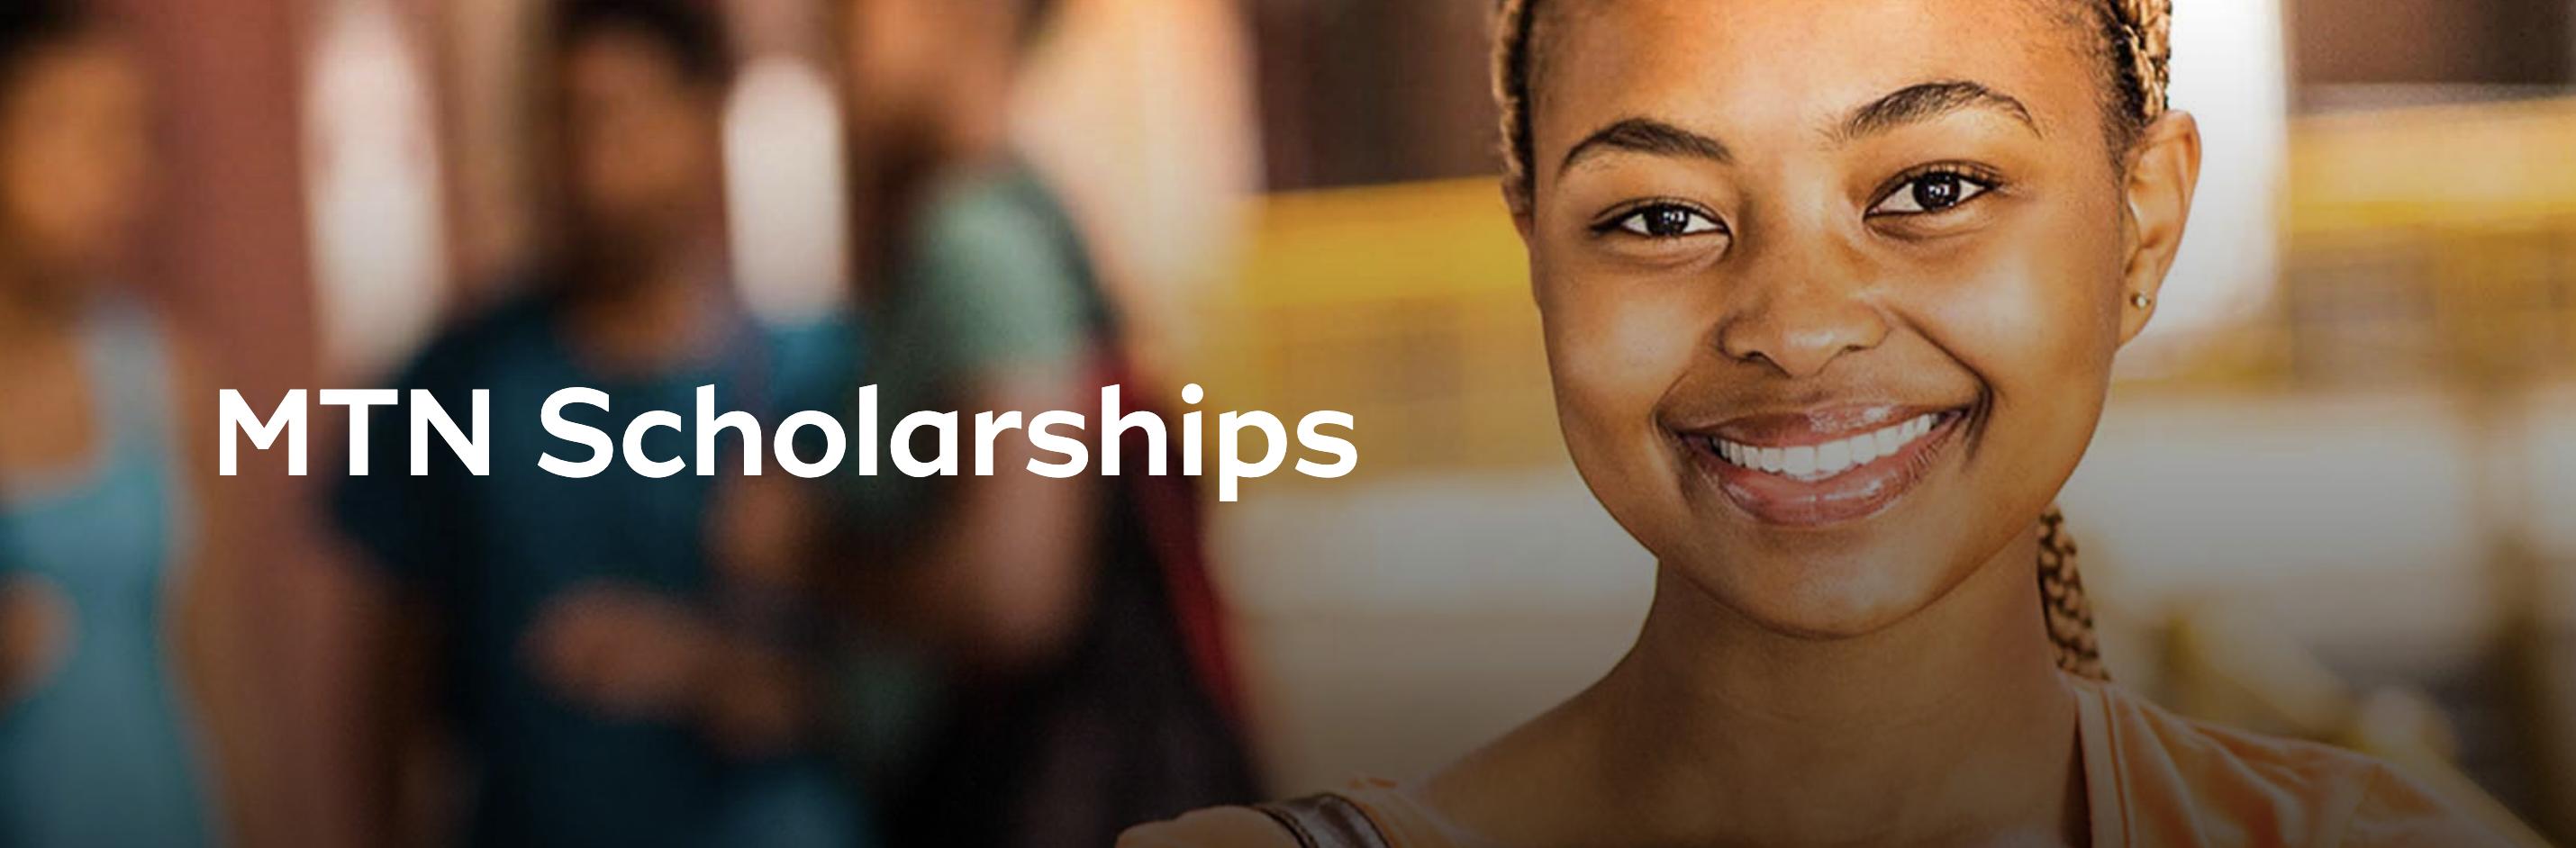 MTN Foundation Scholarship 2020/2021 for 200L Nigerian Students